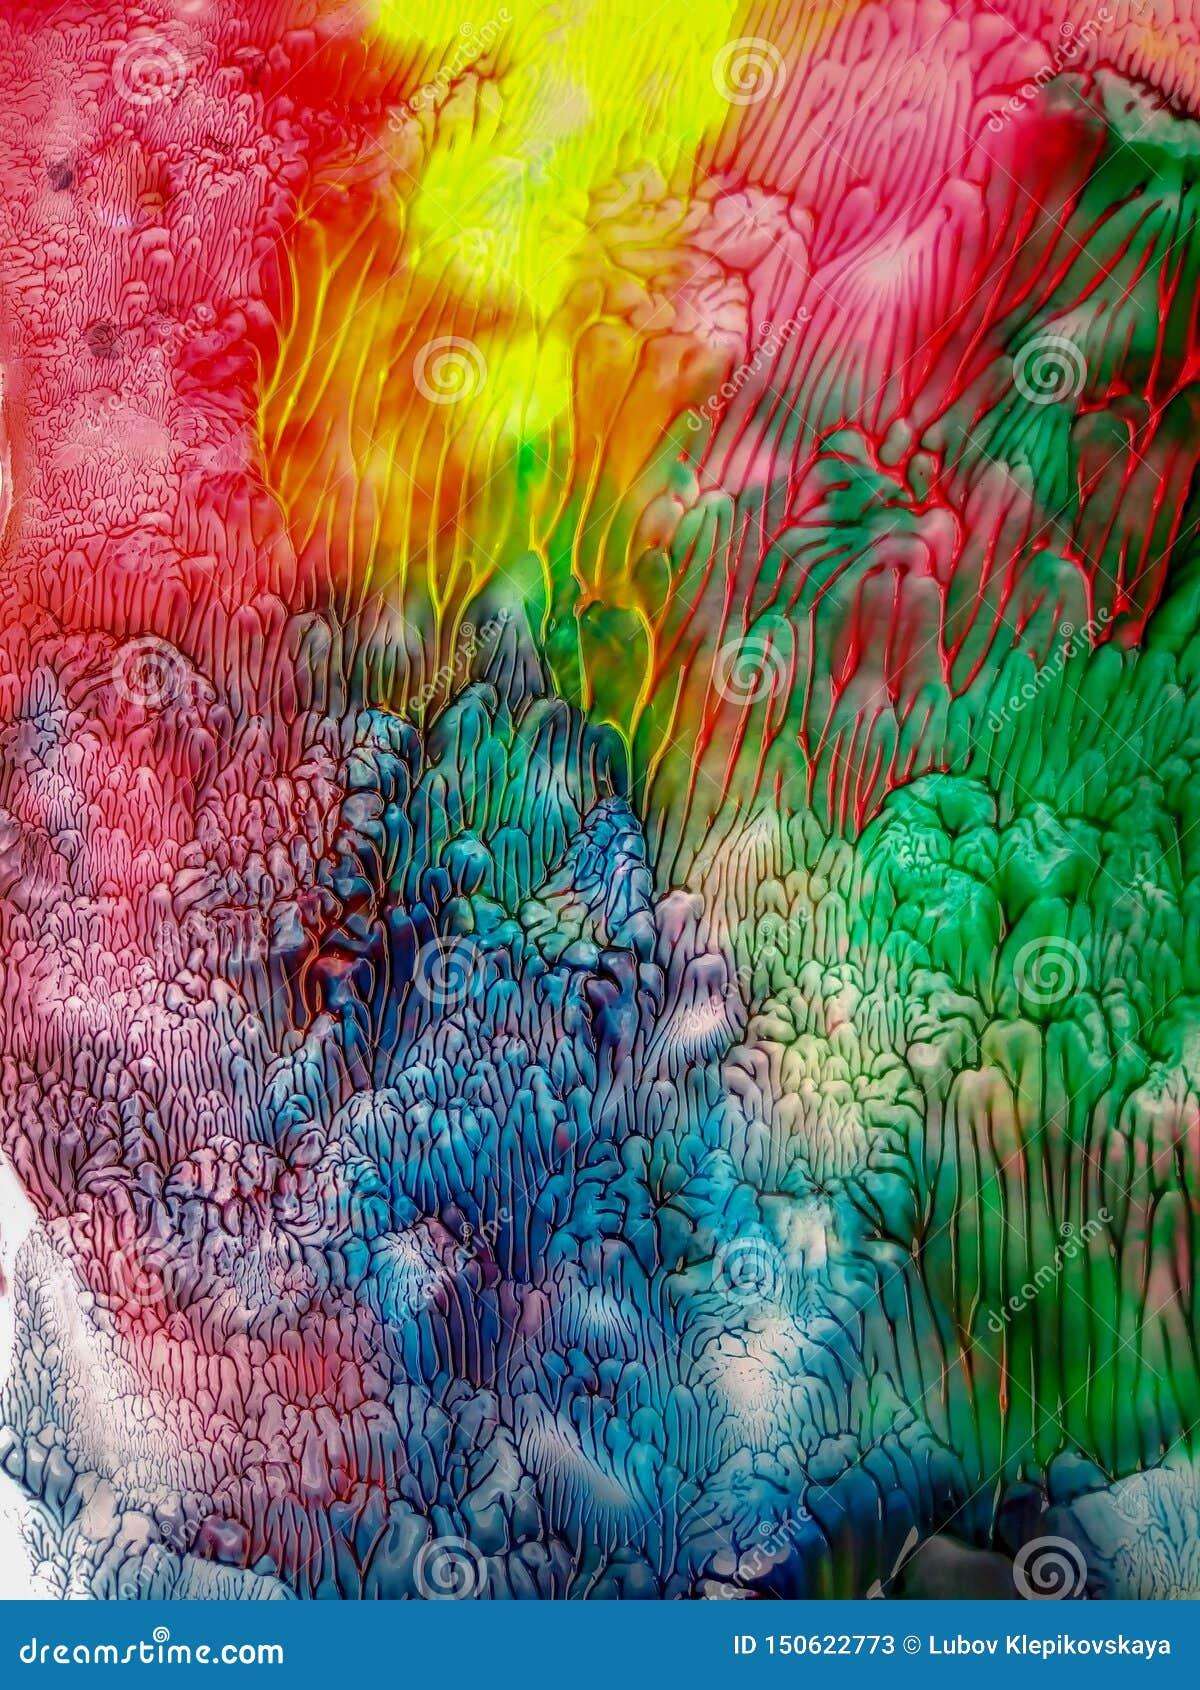 Klare Farben abstrakten Aquarellflecke Aquarells spritzen Hintergrund